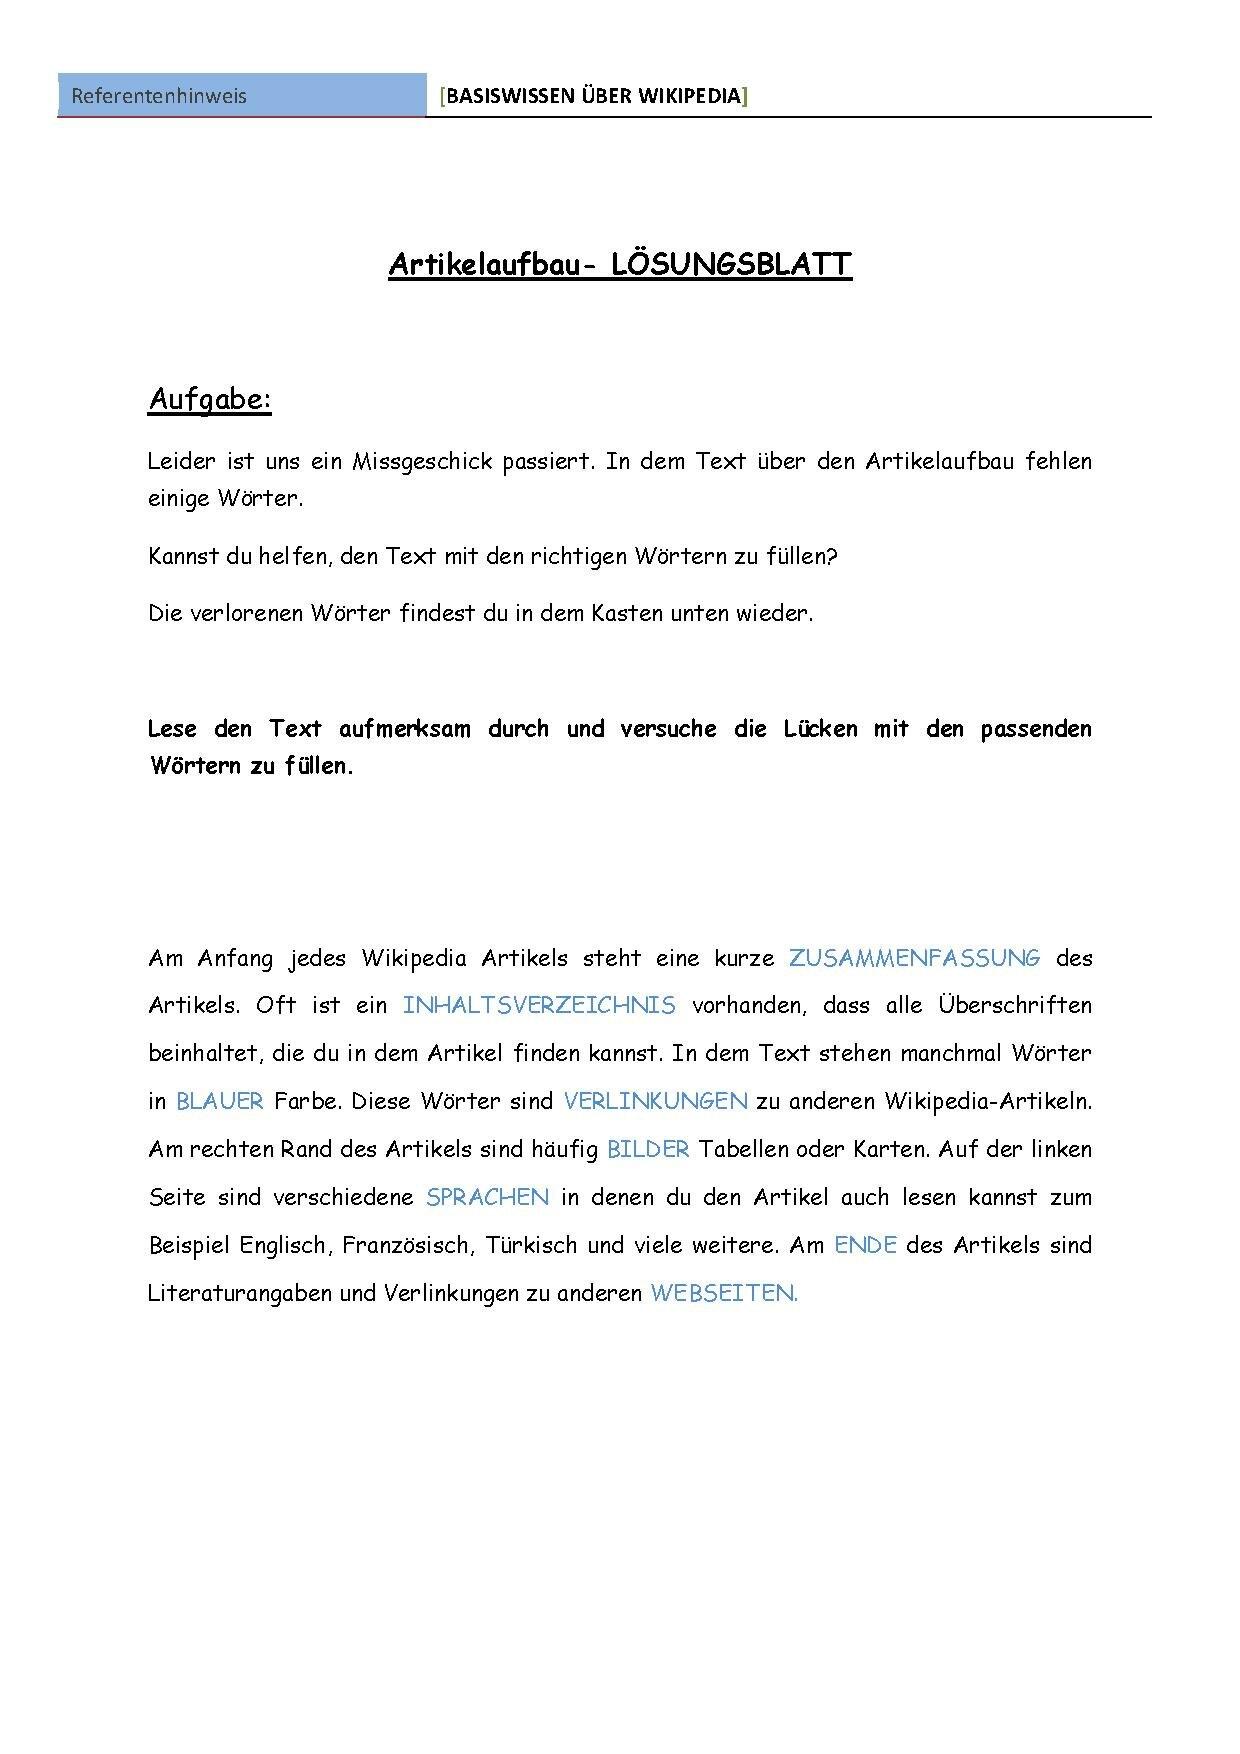 Dateiartikelaufbau Lösungsblattpdf Wikiversity